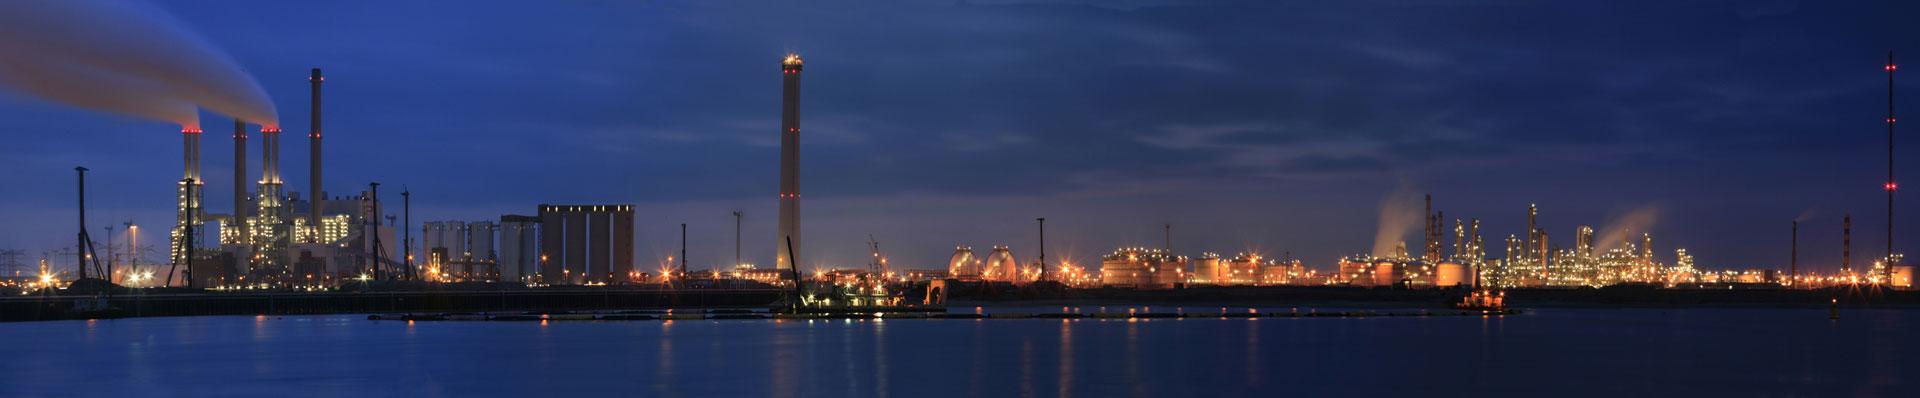 oil refinery skyline at night